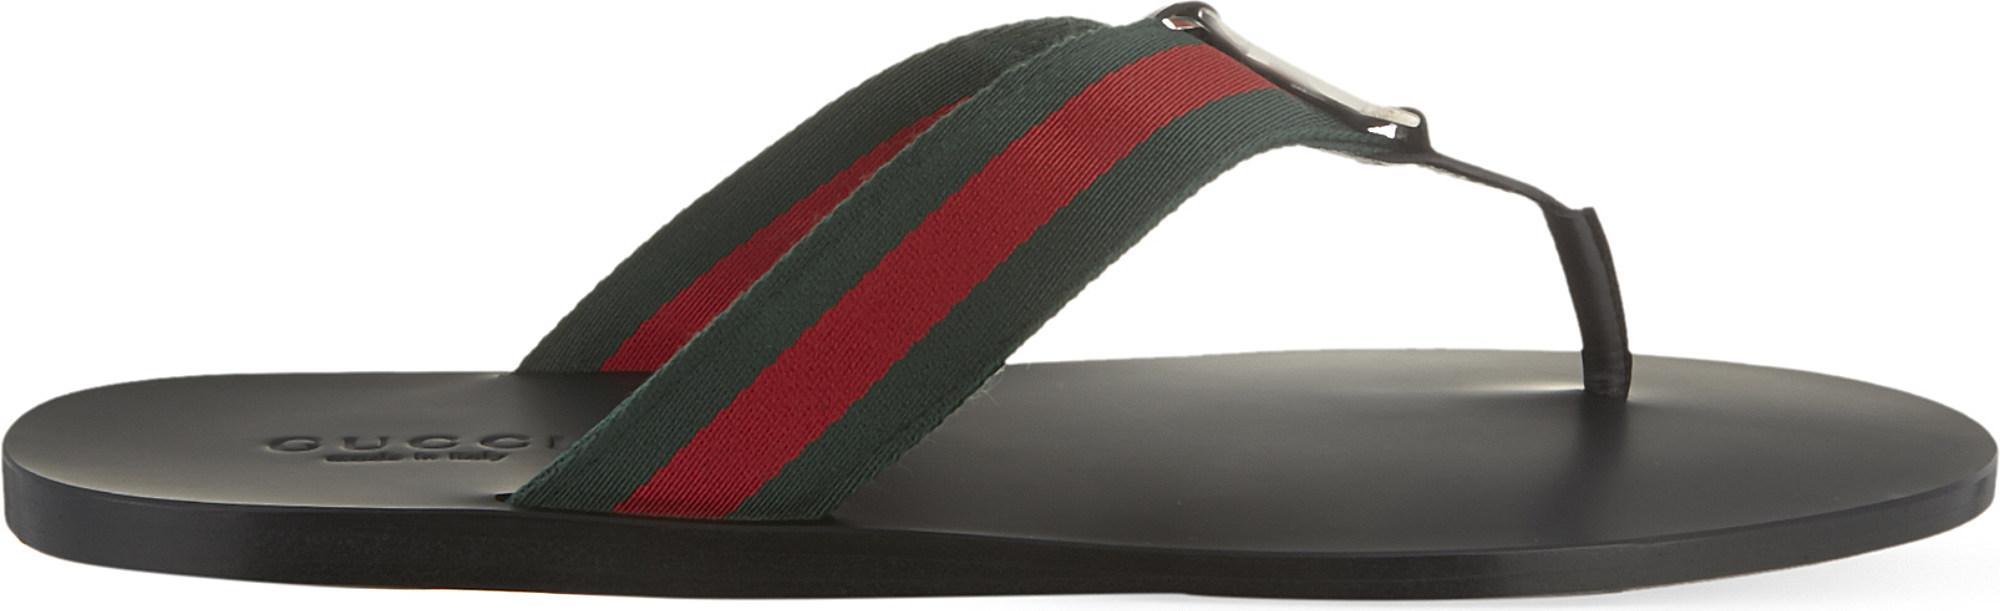 544561c0feab1f Lyst - Gucci Web Flip-flops in Black for Men